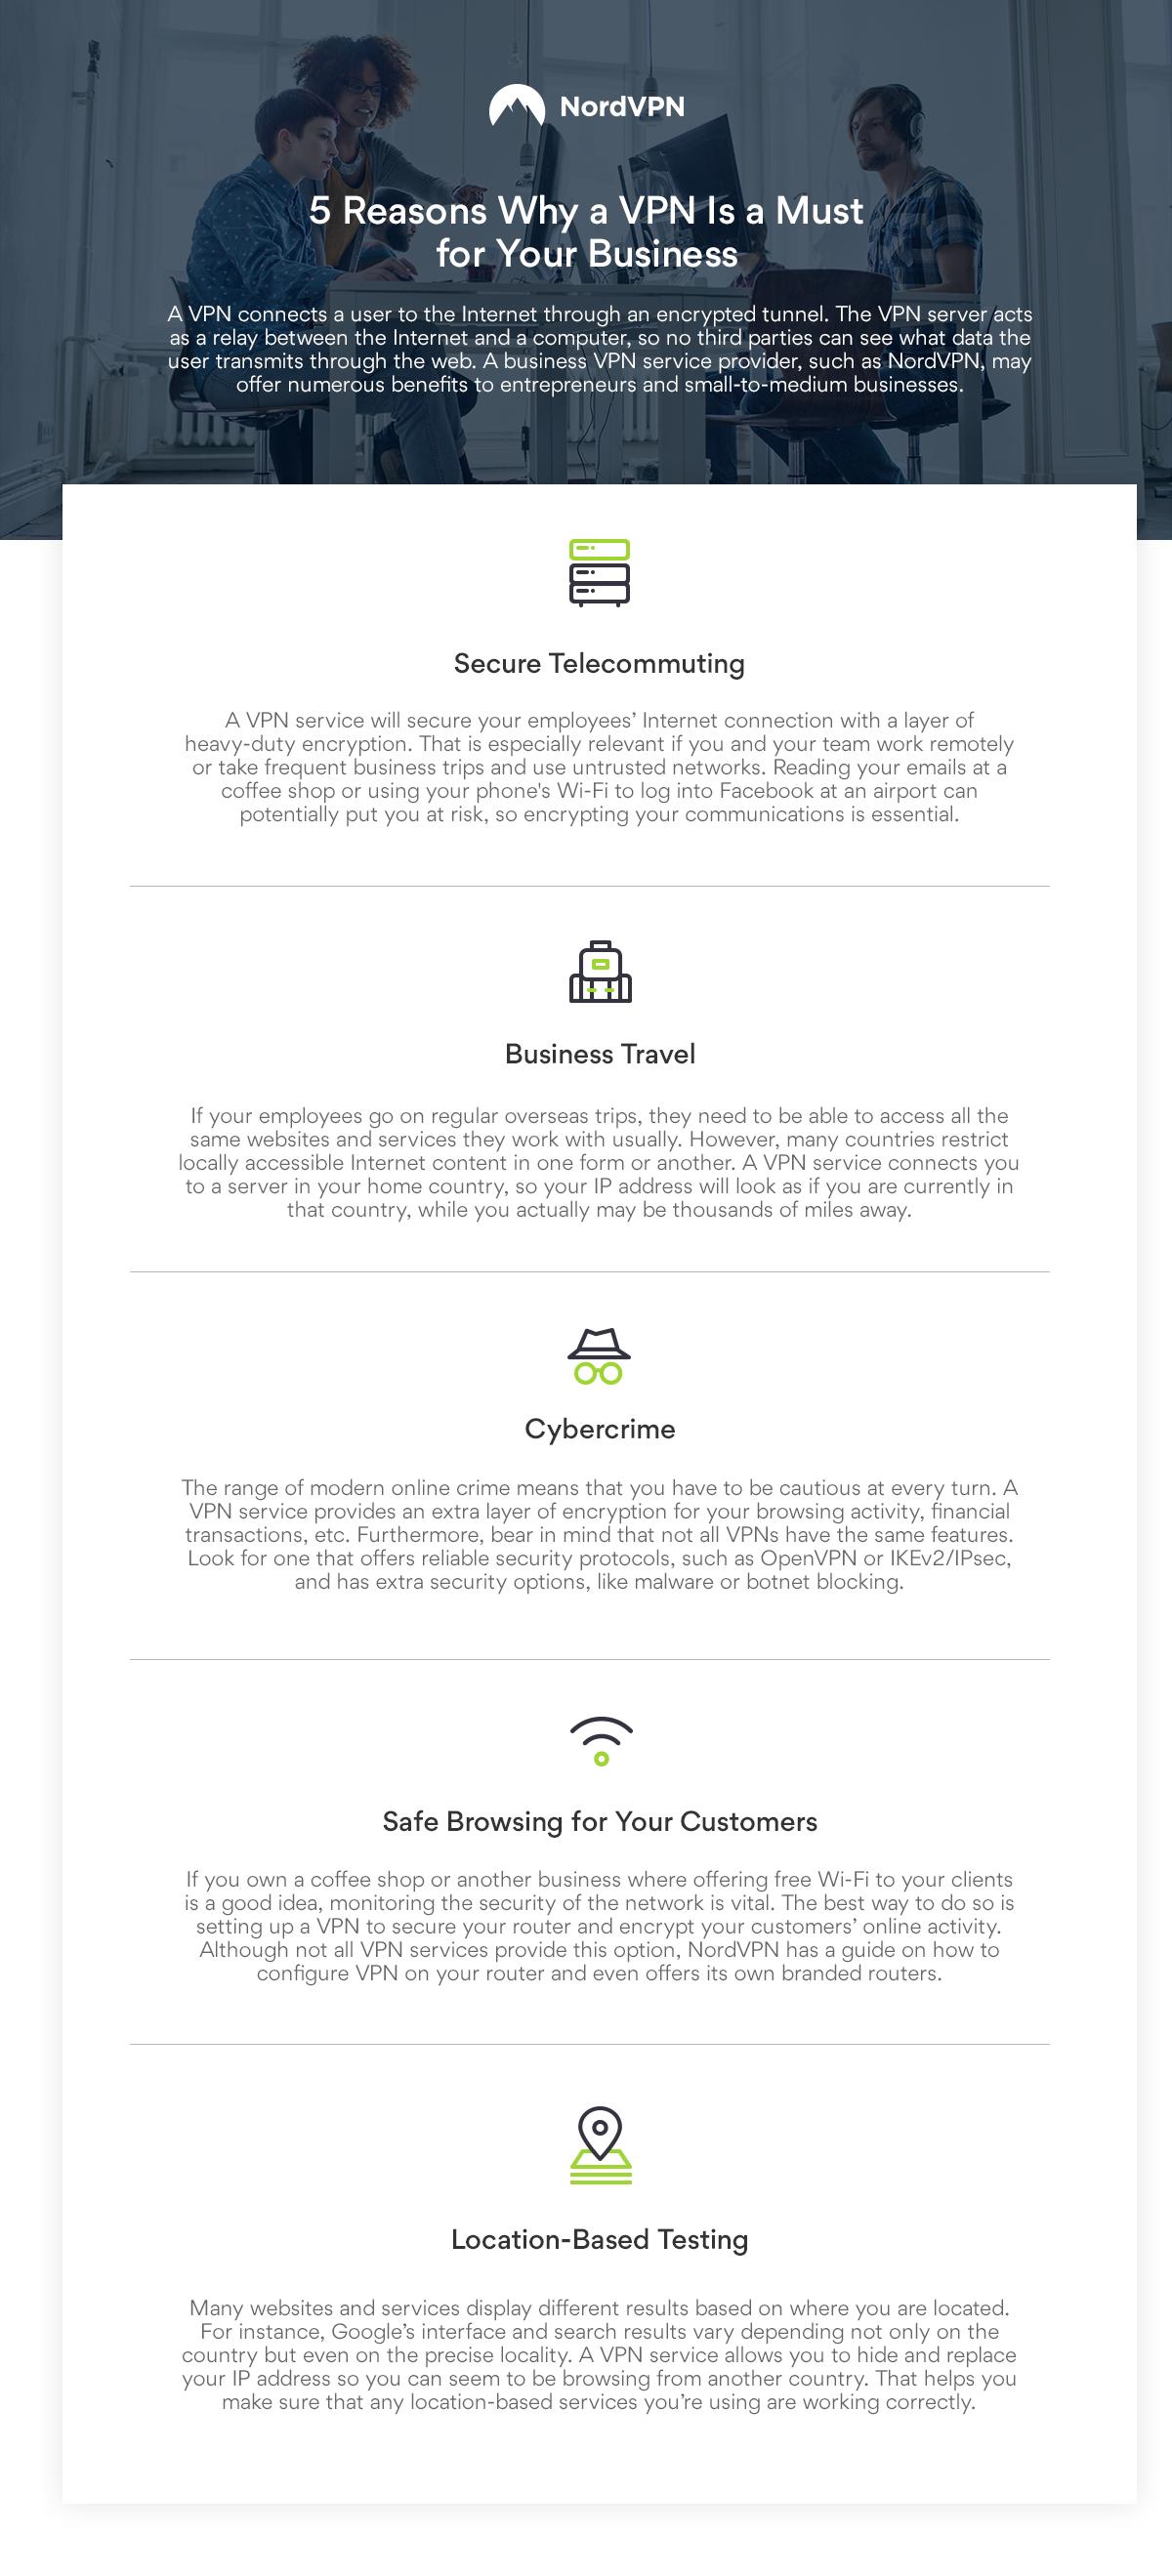 NordVPN is the Best VPN for Business